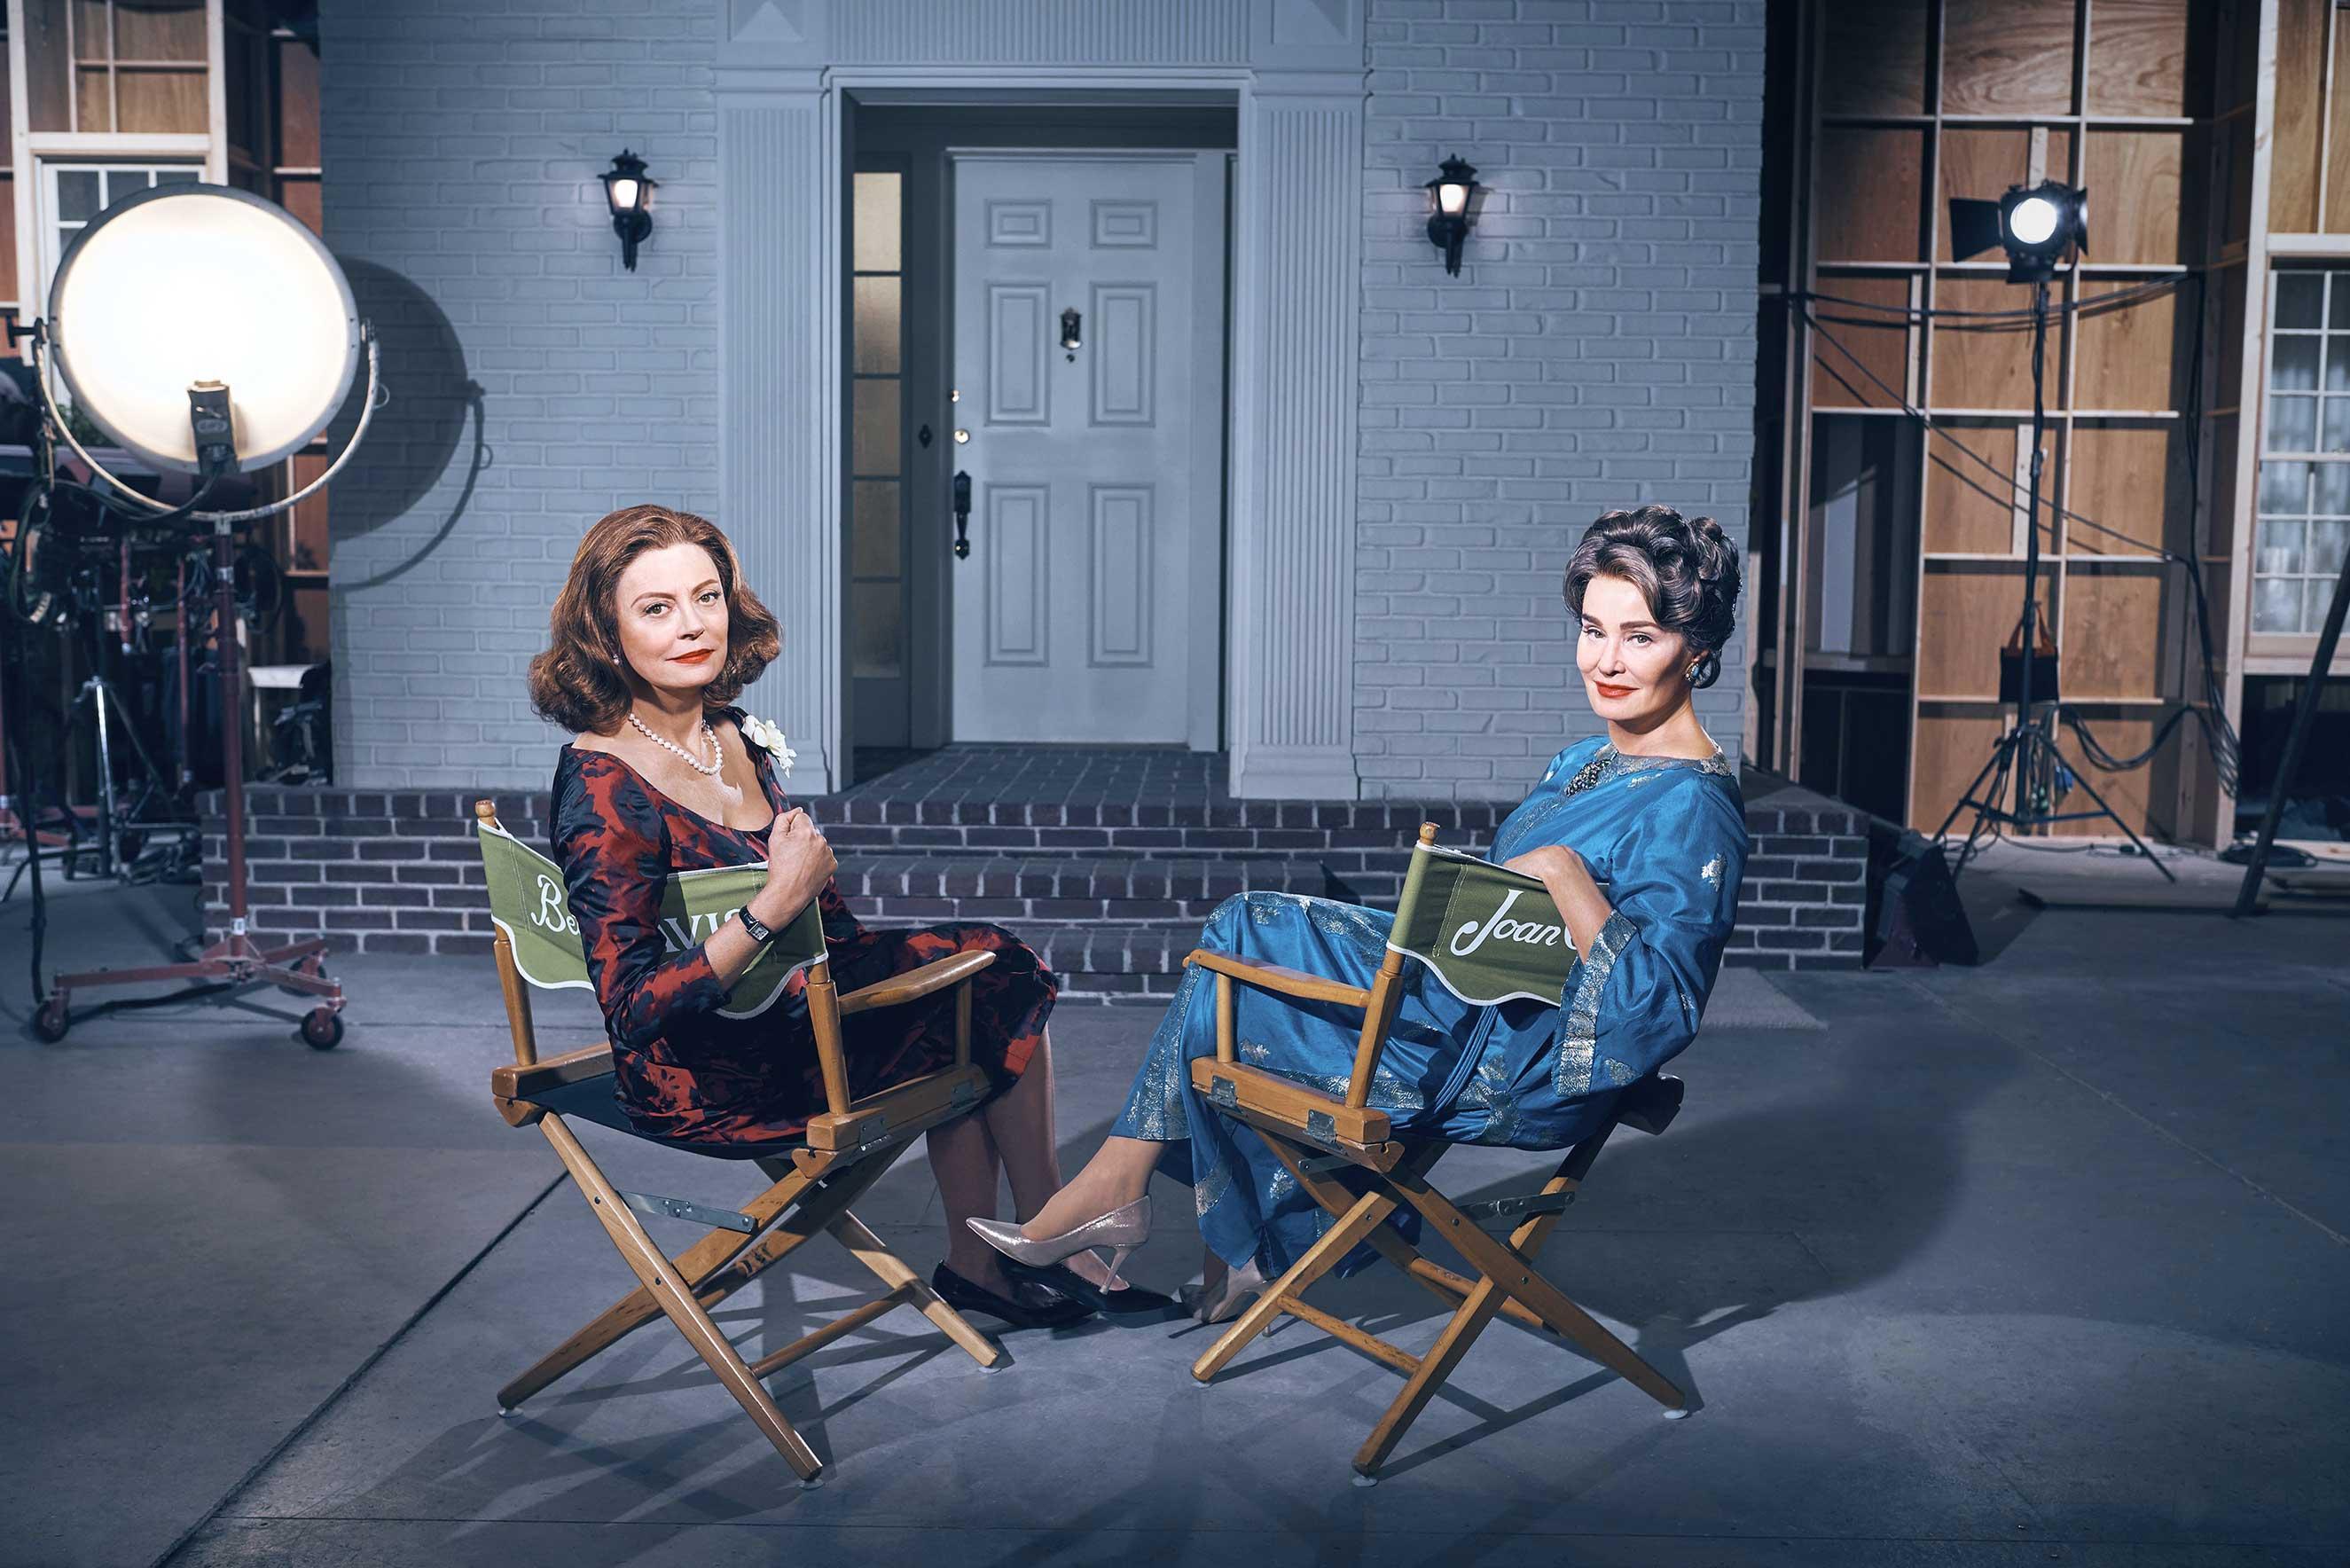 (L-R) Susan Sarandon as Bette Davis, Jessica Lange as Joan Crawford in FX Network's 'Feud'